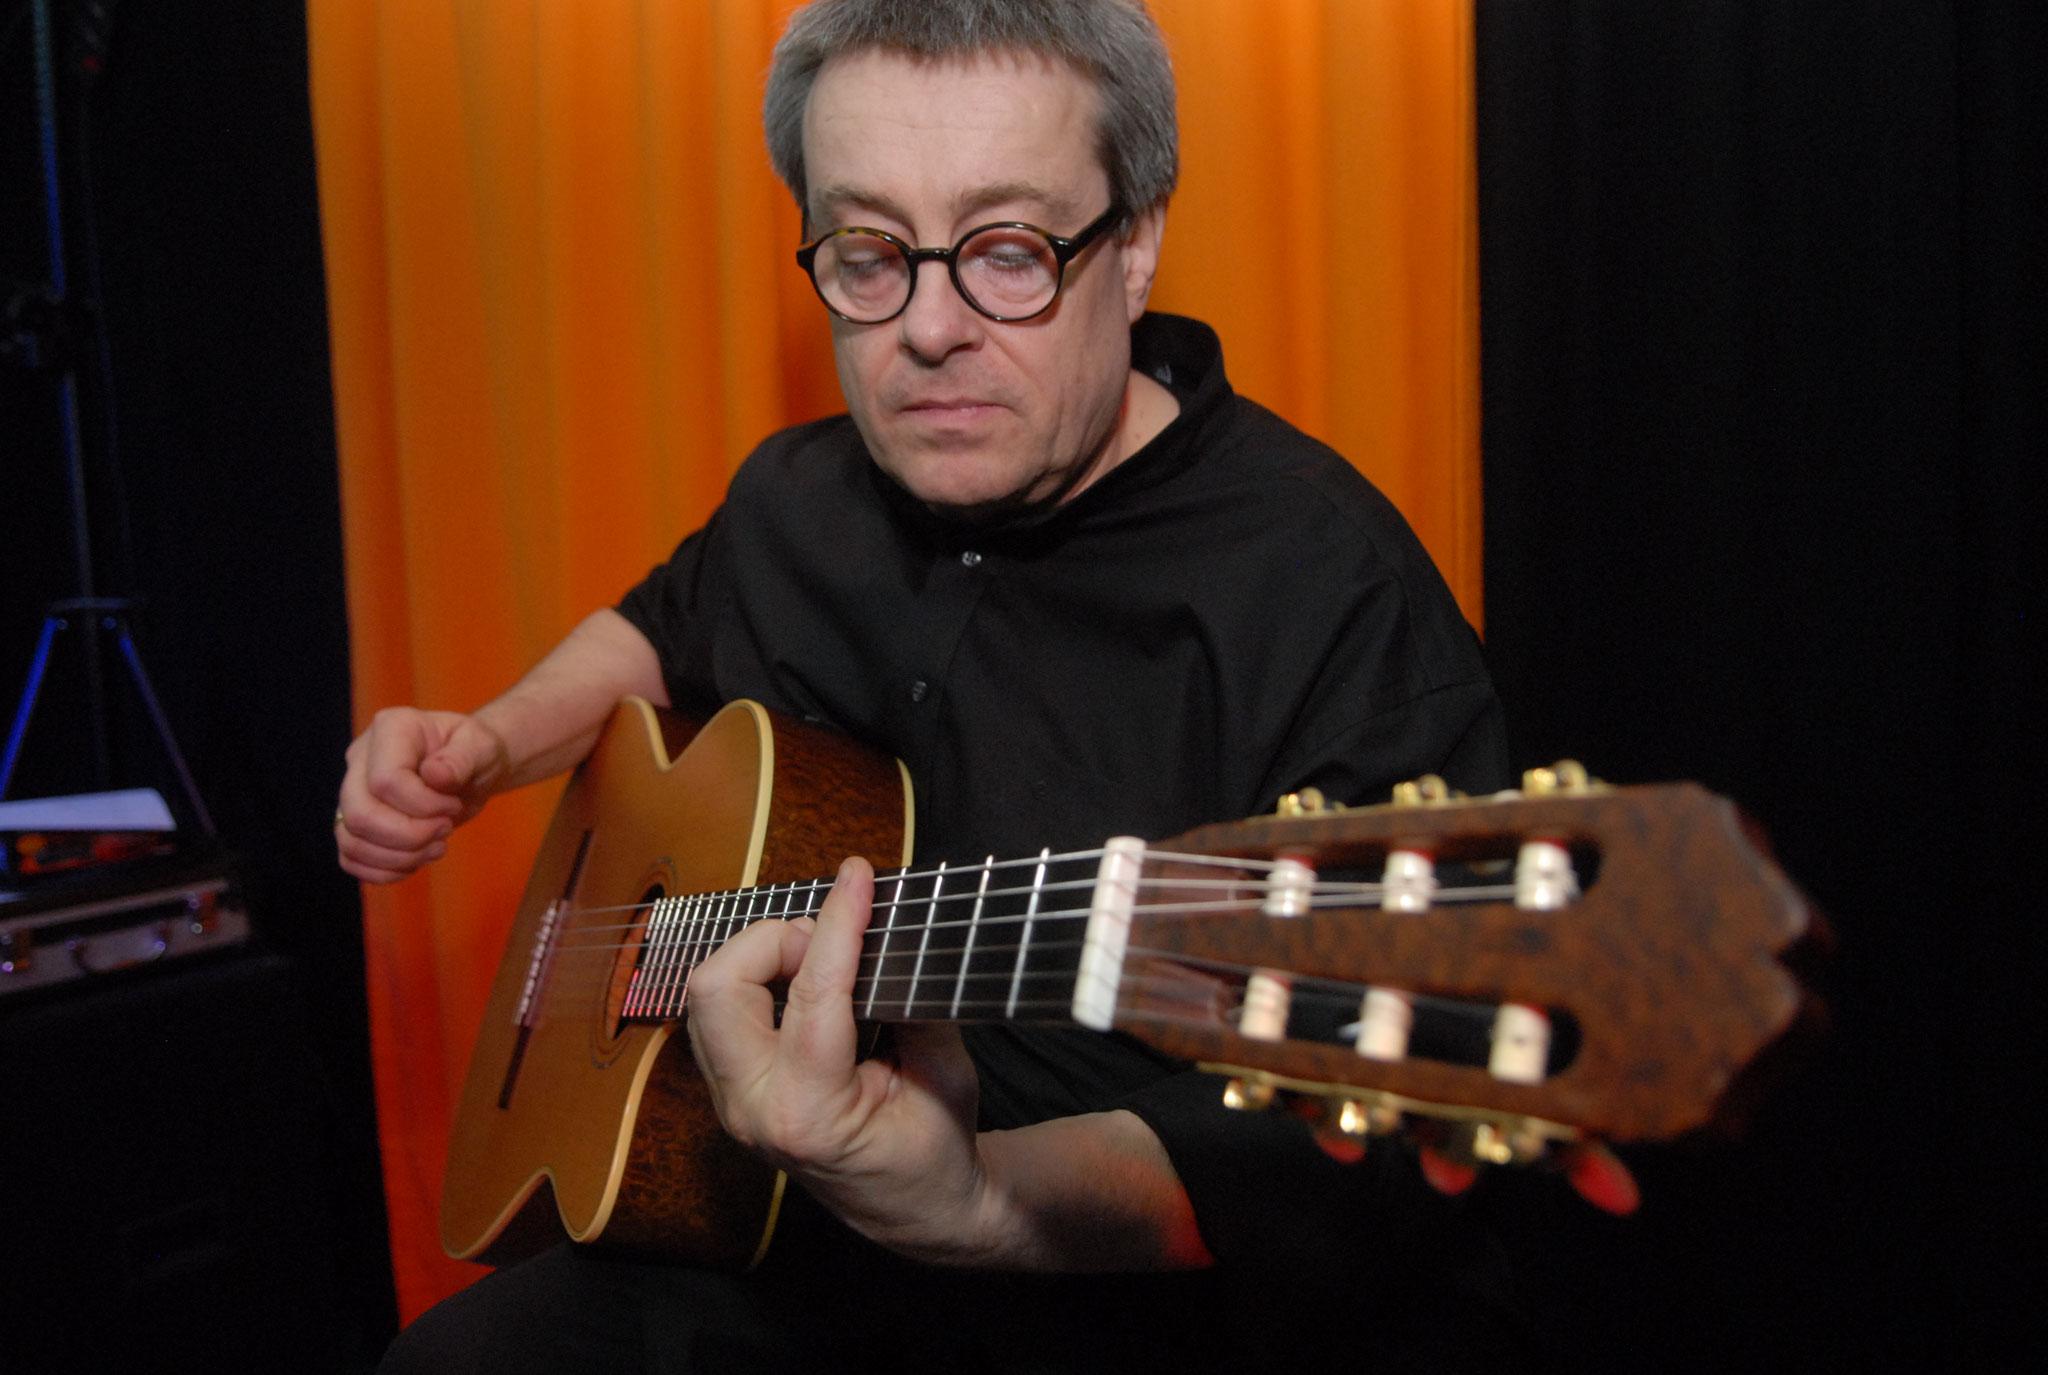 m i c h a e l . a. . s c h n a s e - akustische & elektrische gitarren | lead-gesang